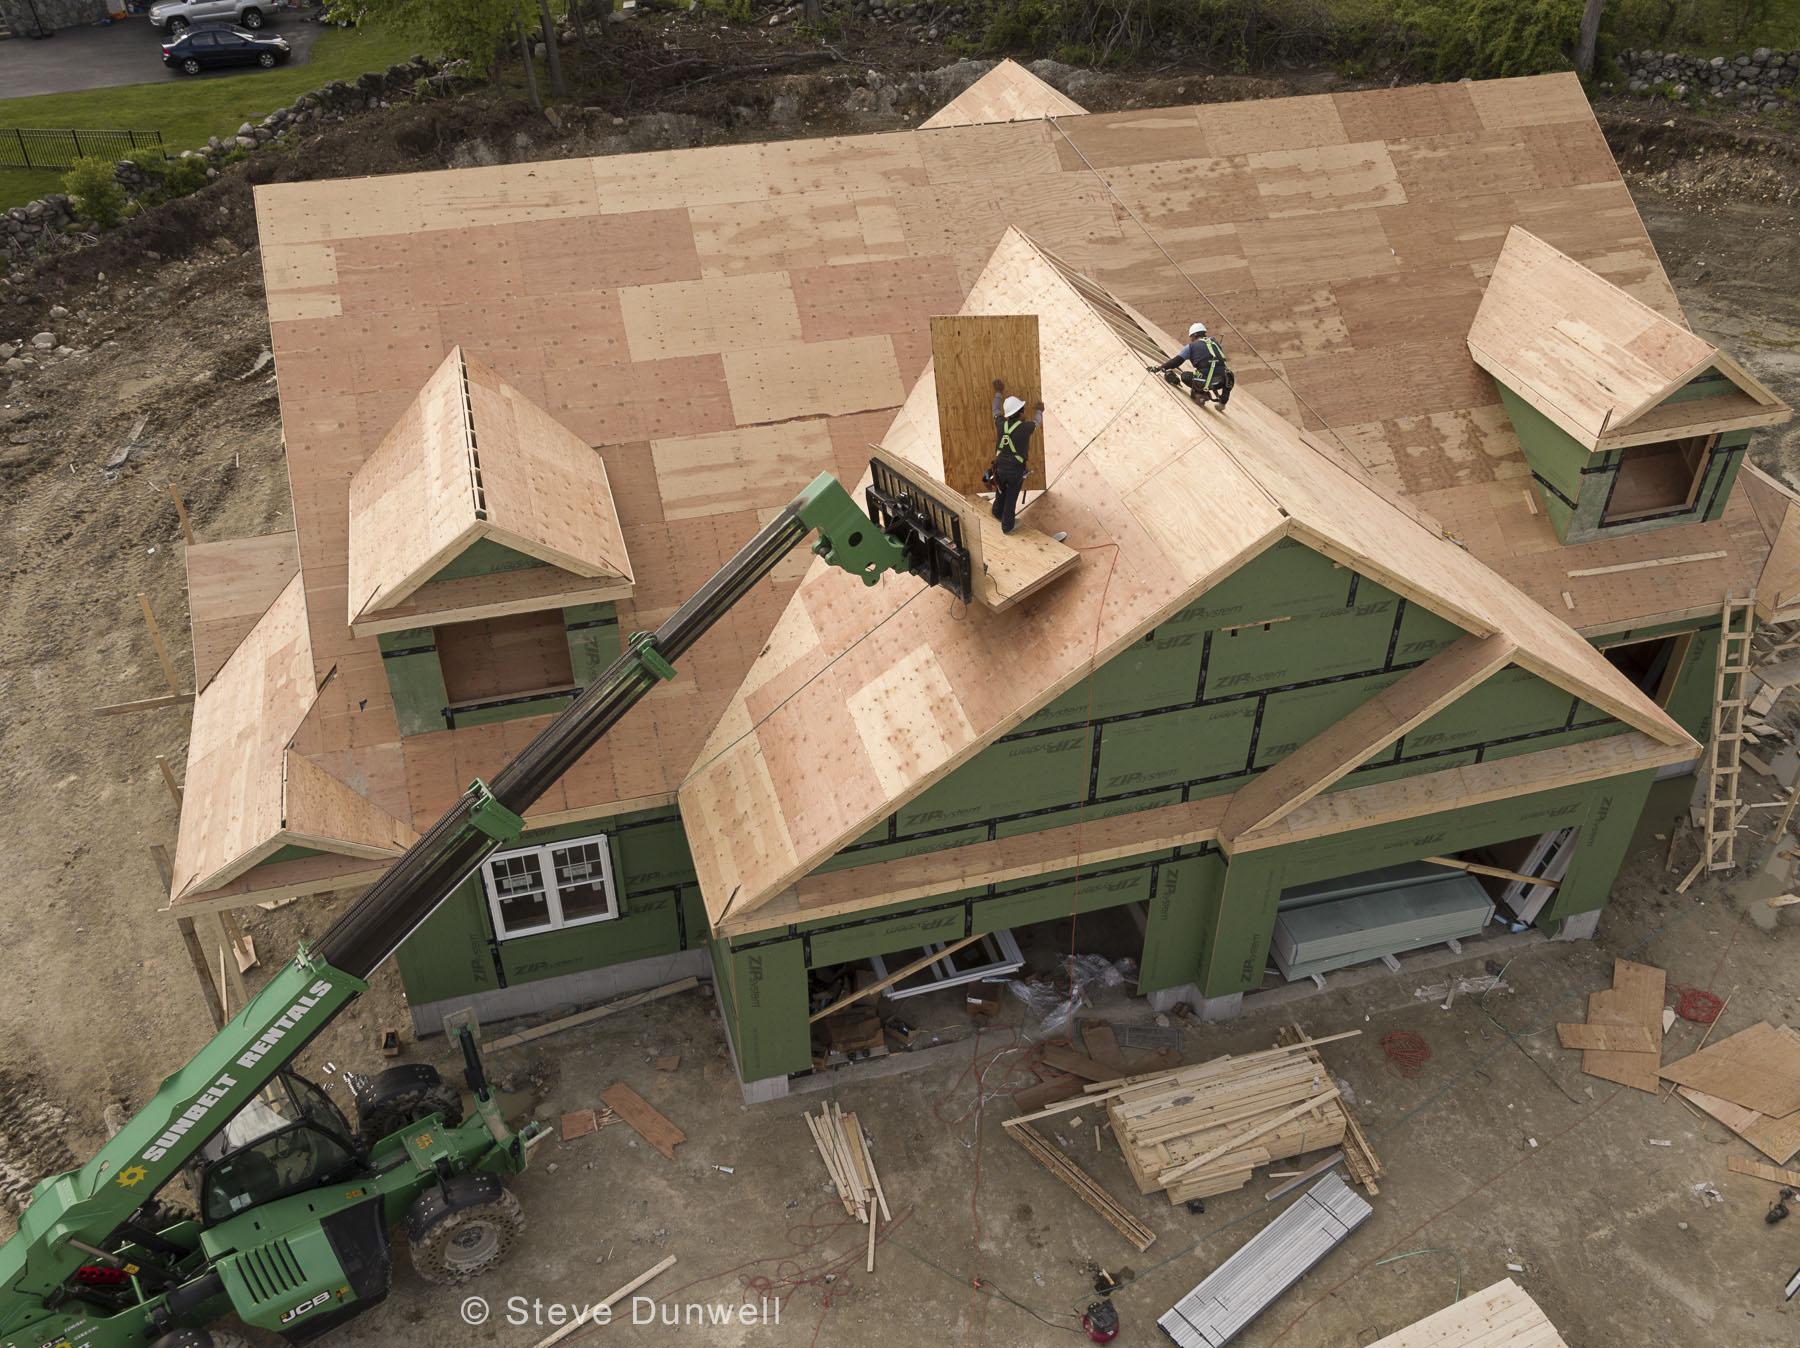 House construction aerial, Dracut, MA